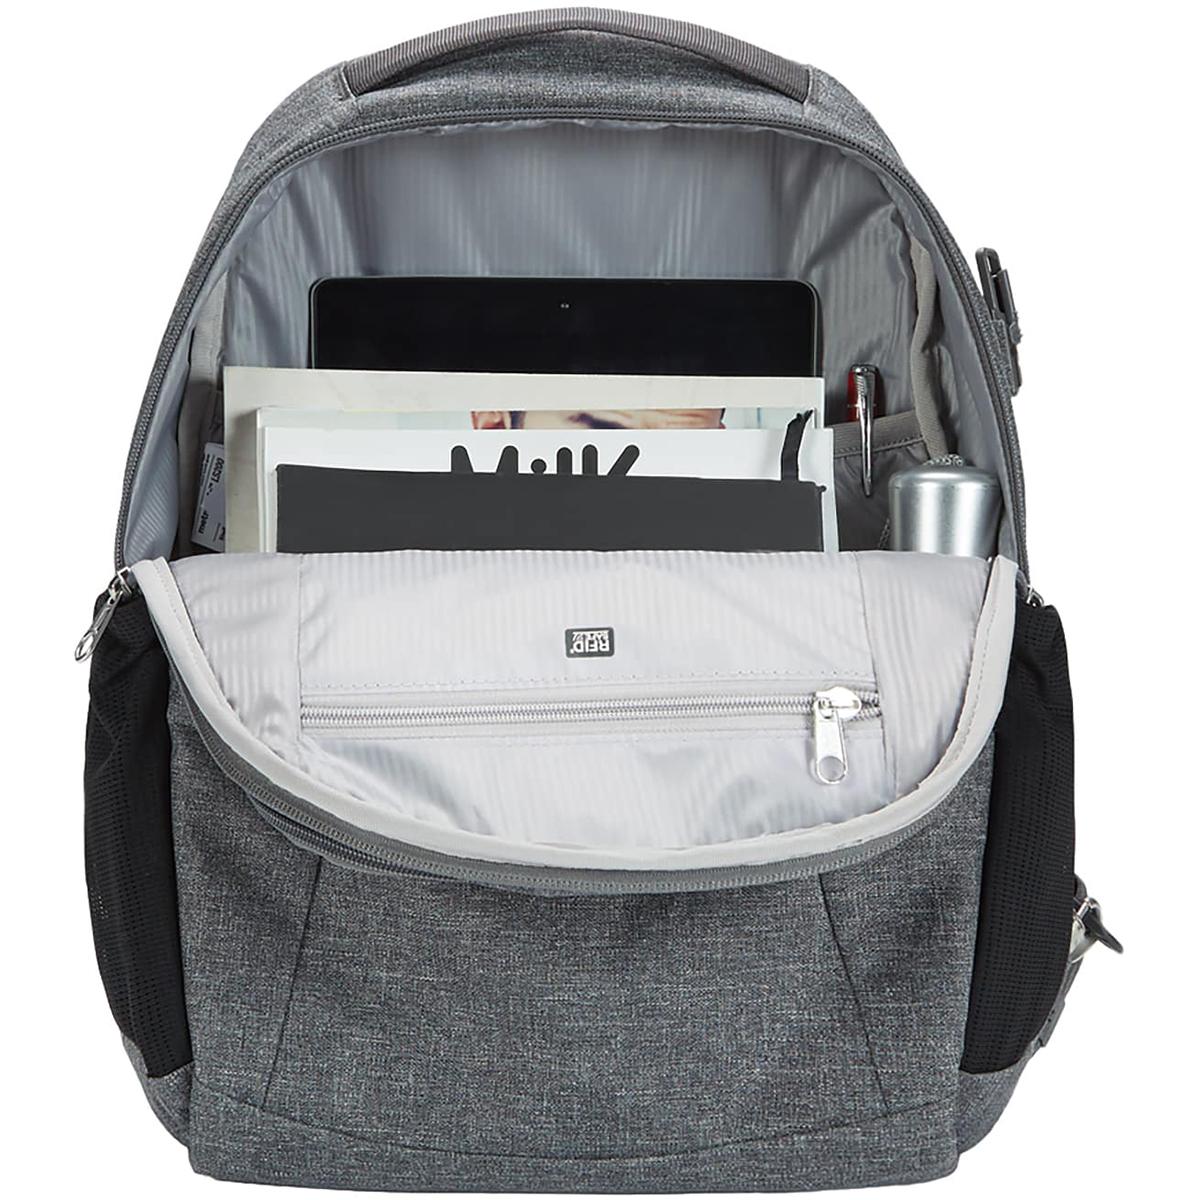 PacSafe-MetroSafe-LS350-Anti-Theft-15L-Backpack miniature 10